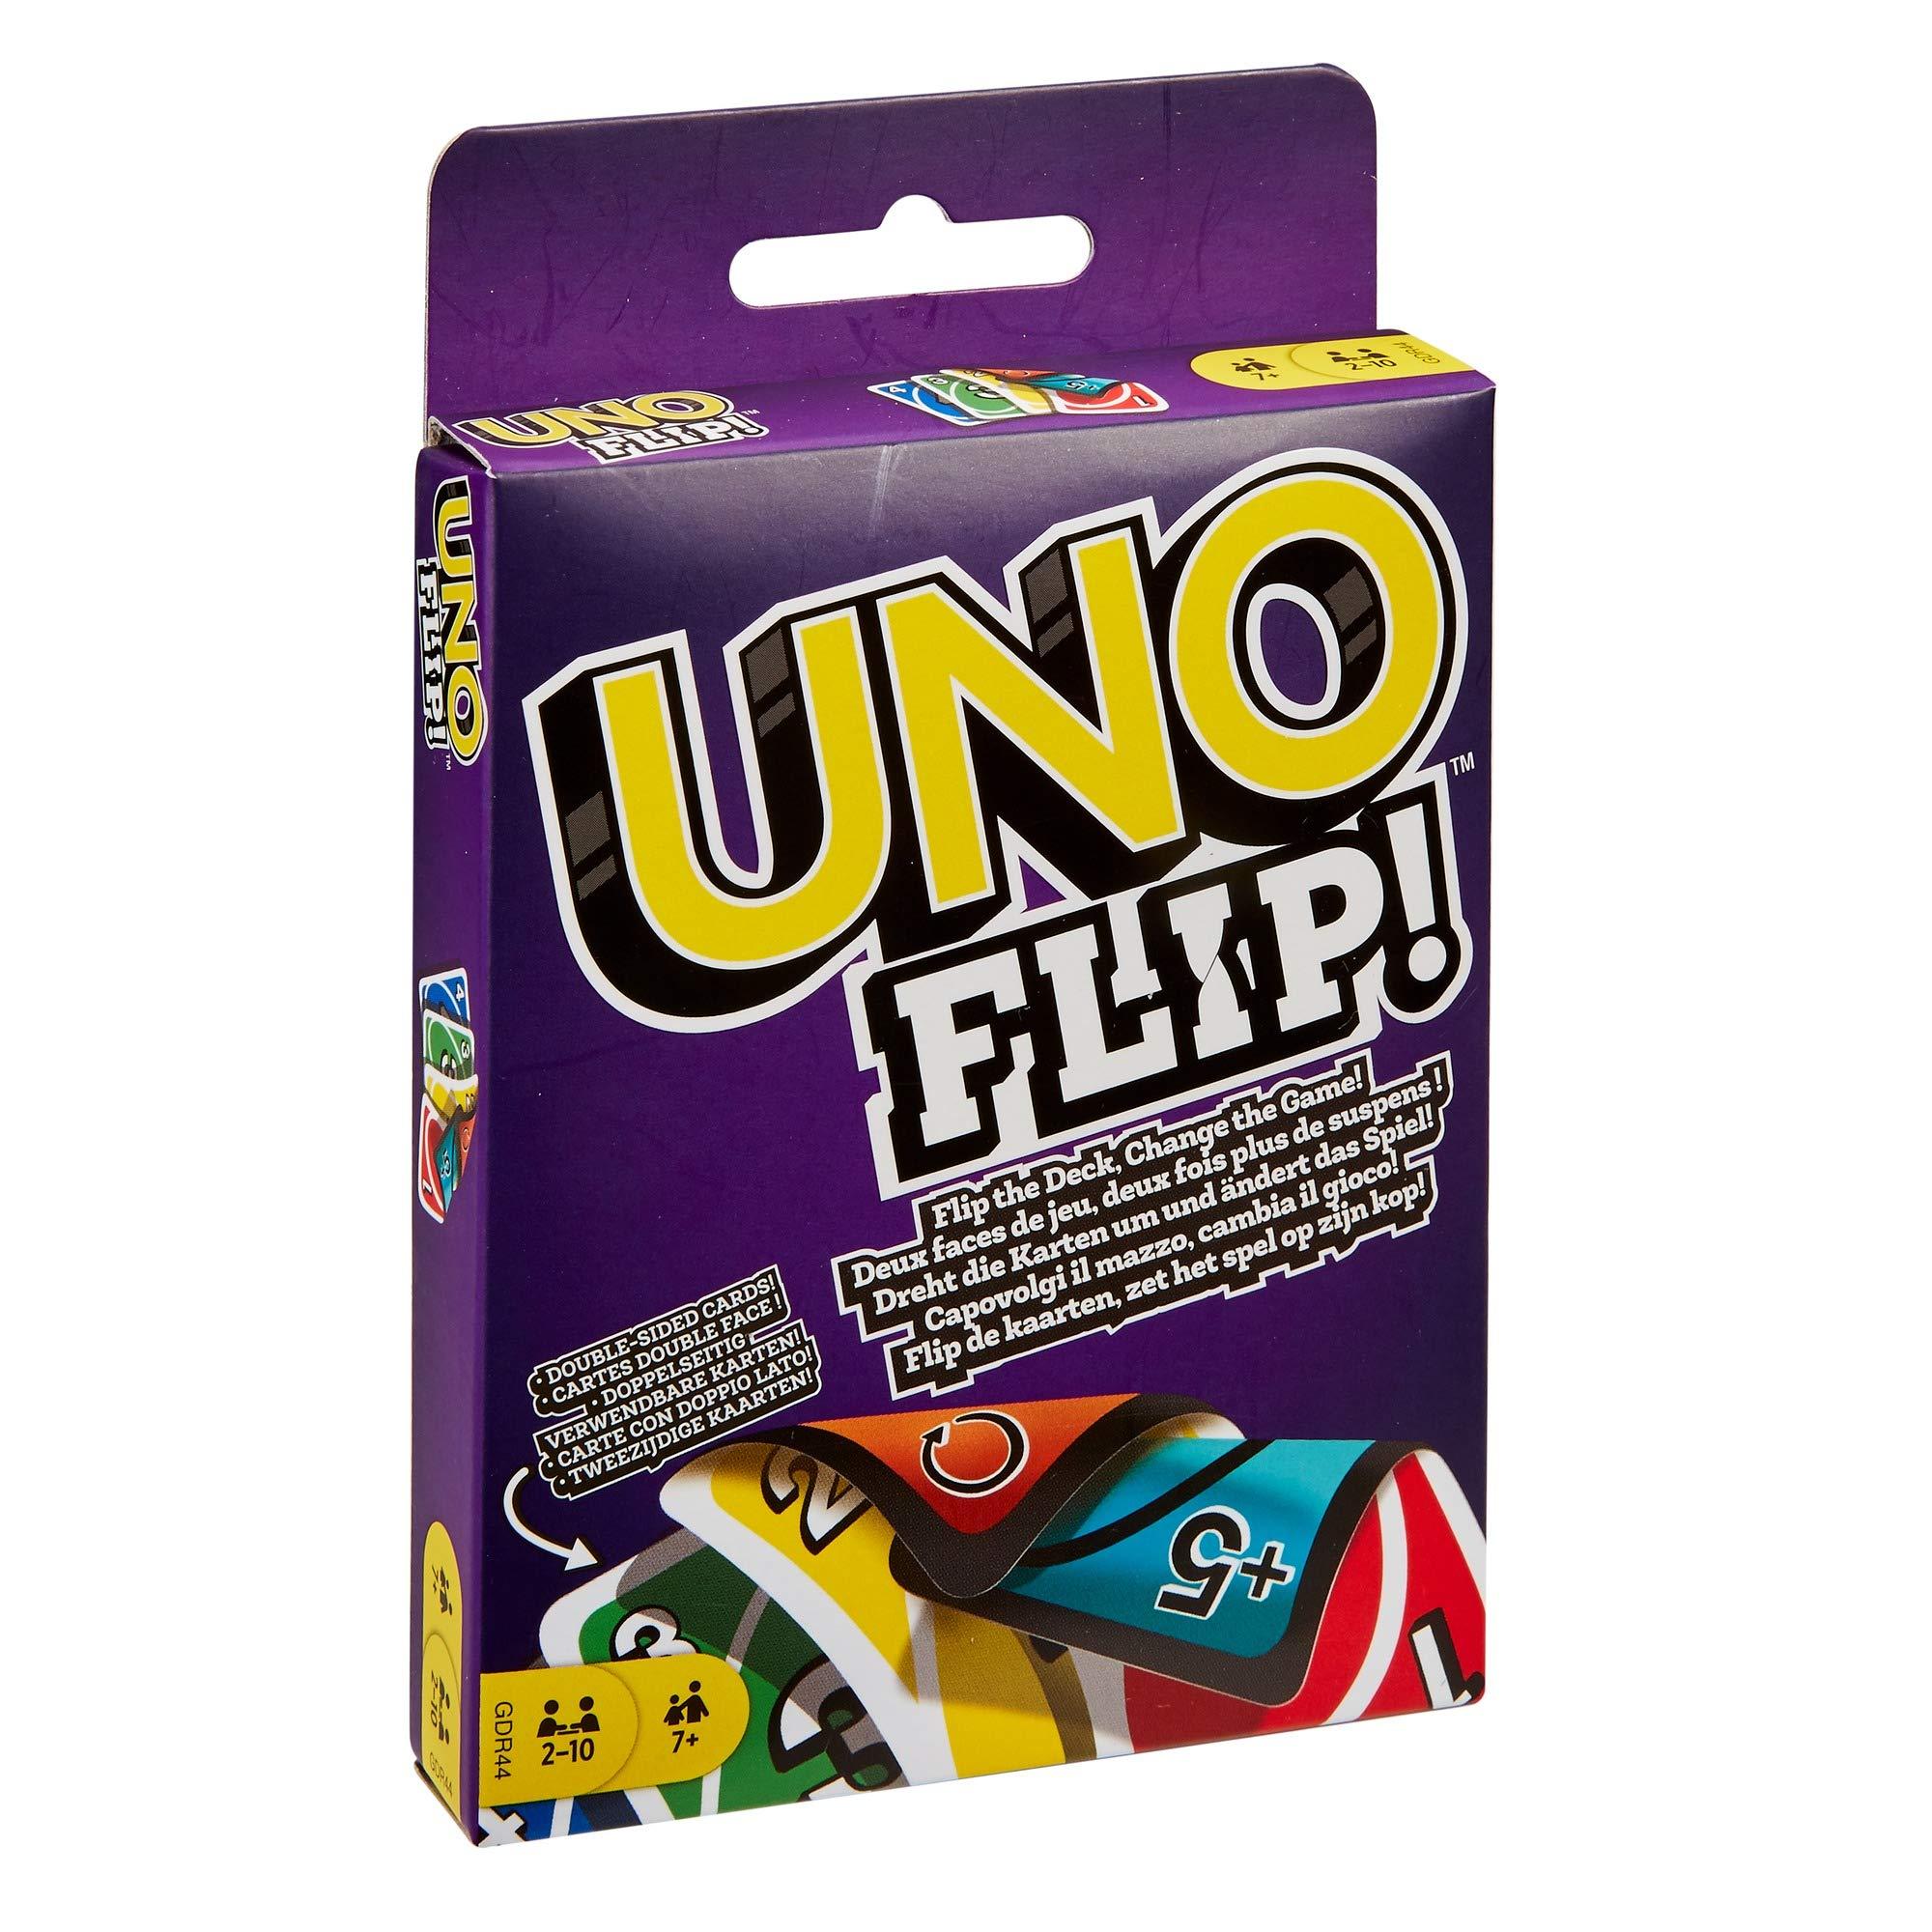 Mattel Games Uno Flip Side product image